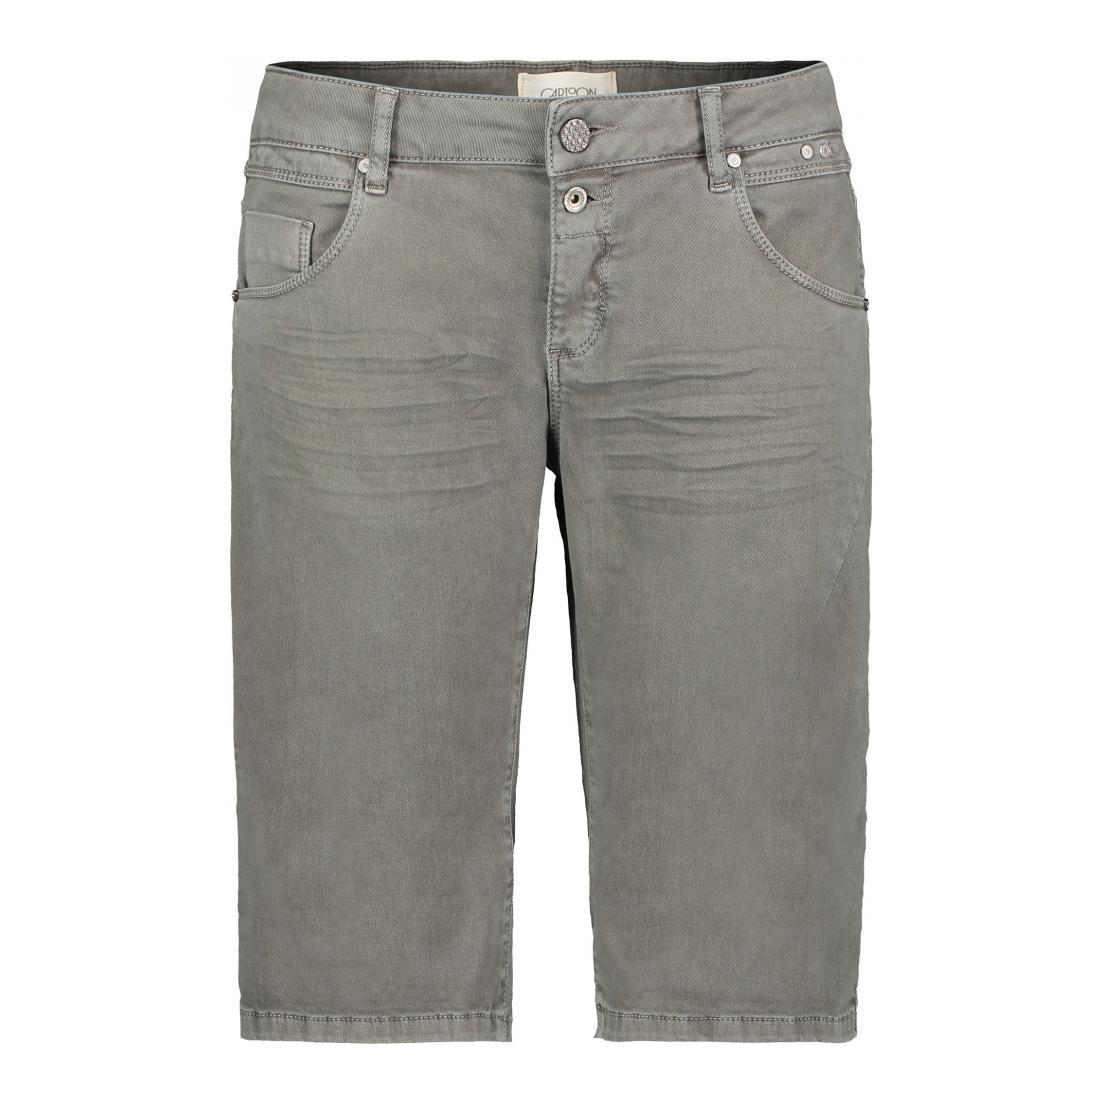 Cartoon Bermuda/Shorts Damen Shorts Jeans